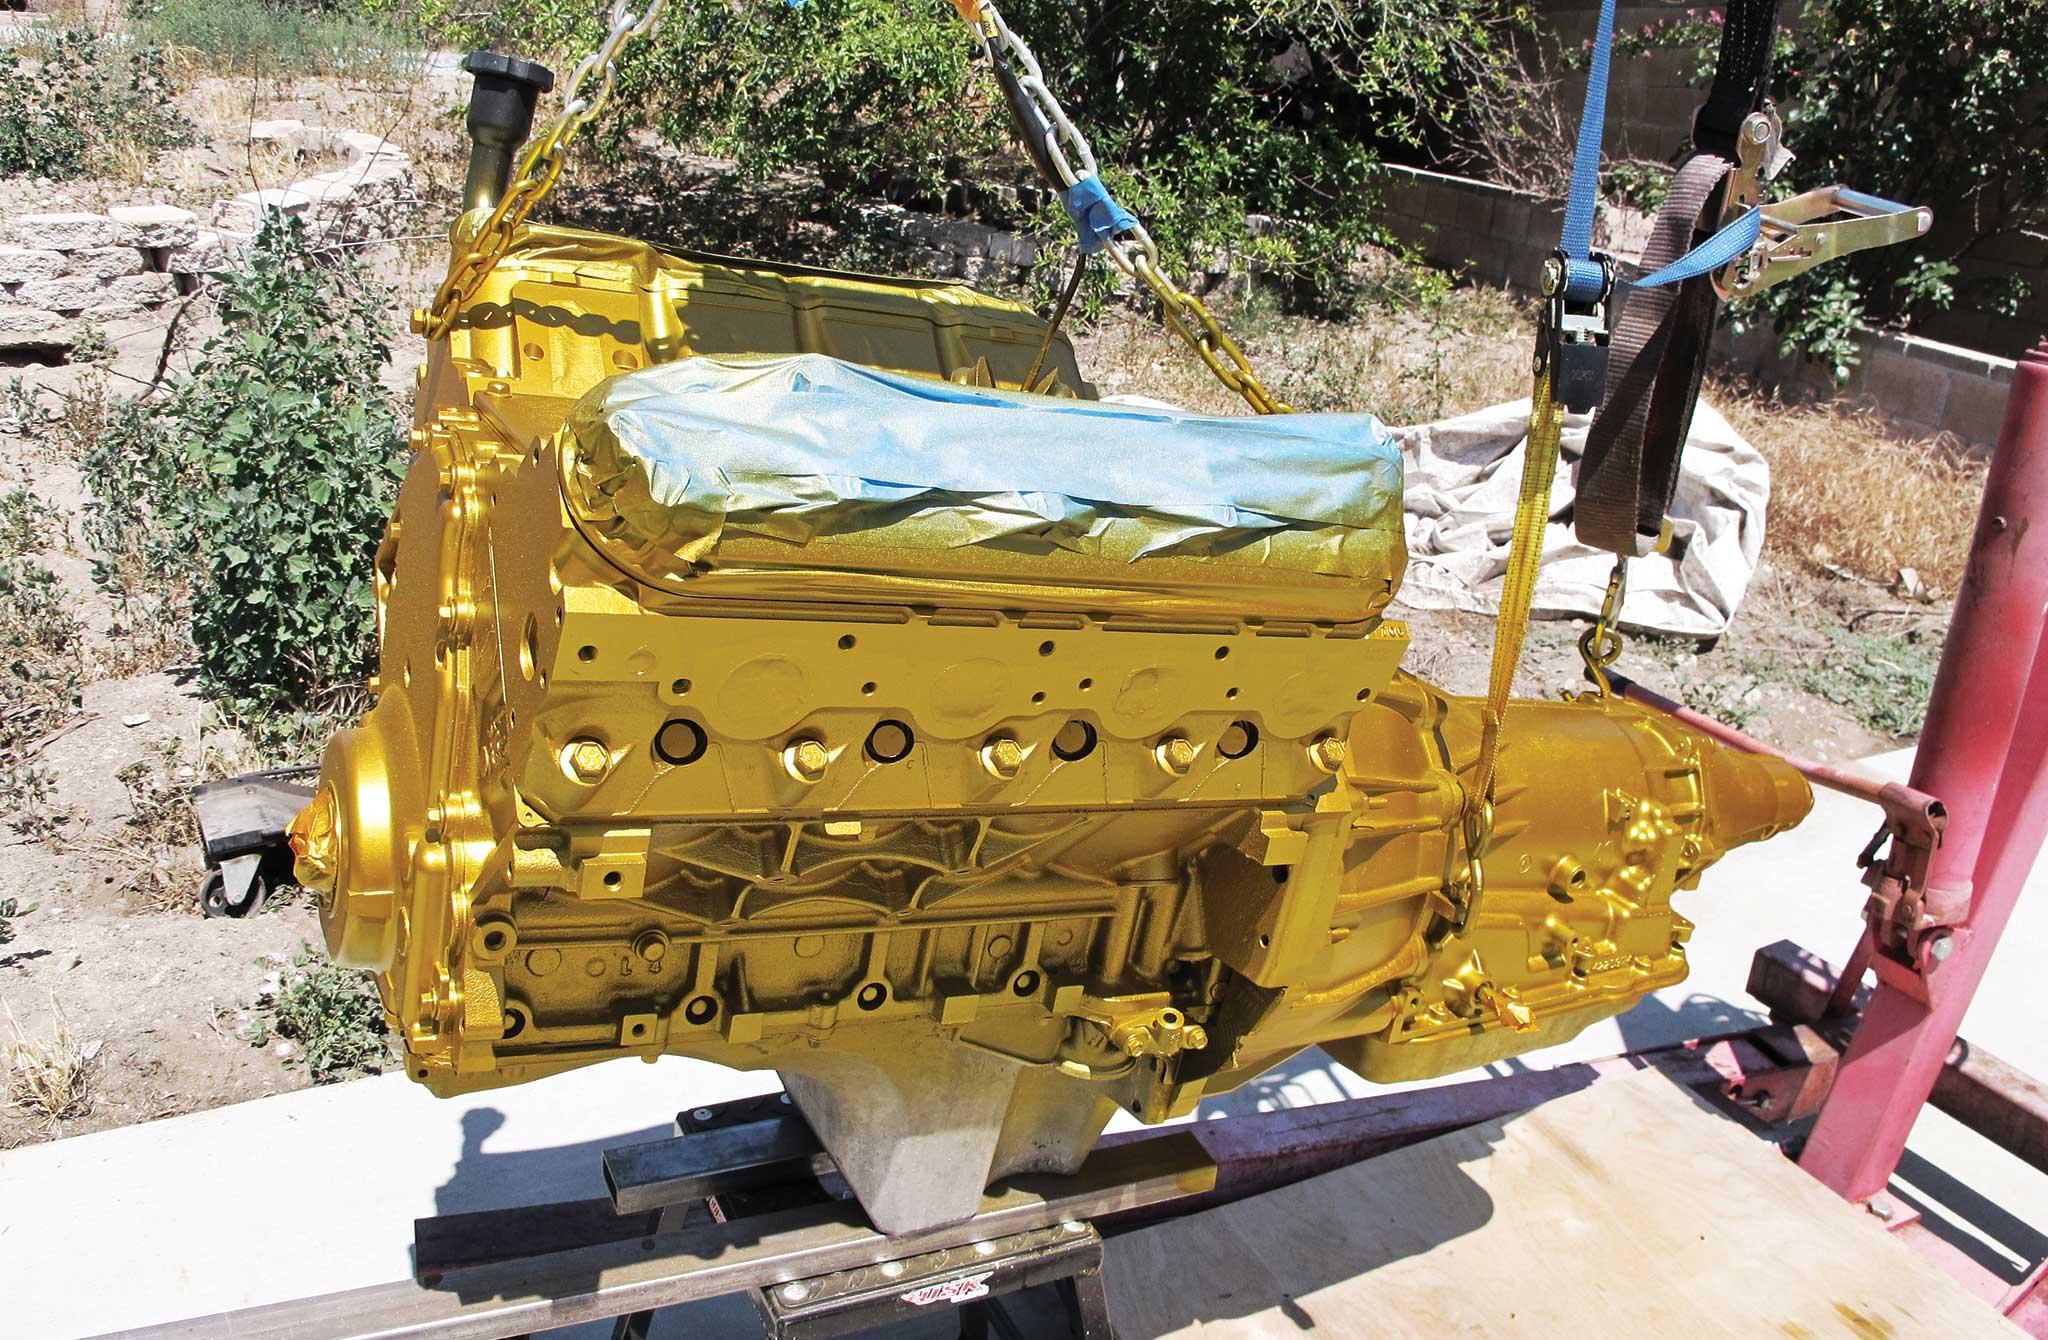 002 building an ls1 into a show engine axalta desperado gold finish